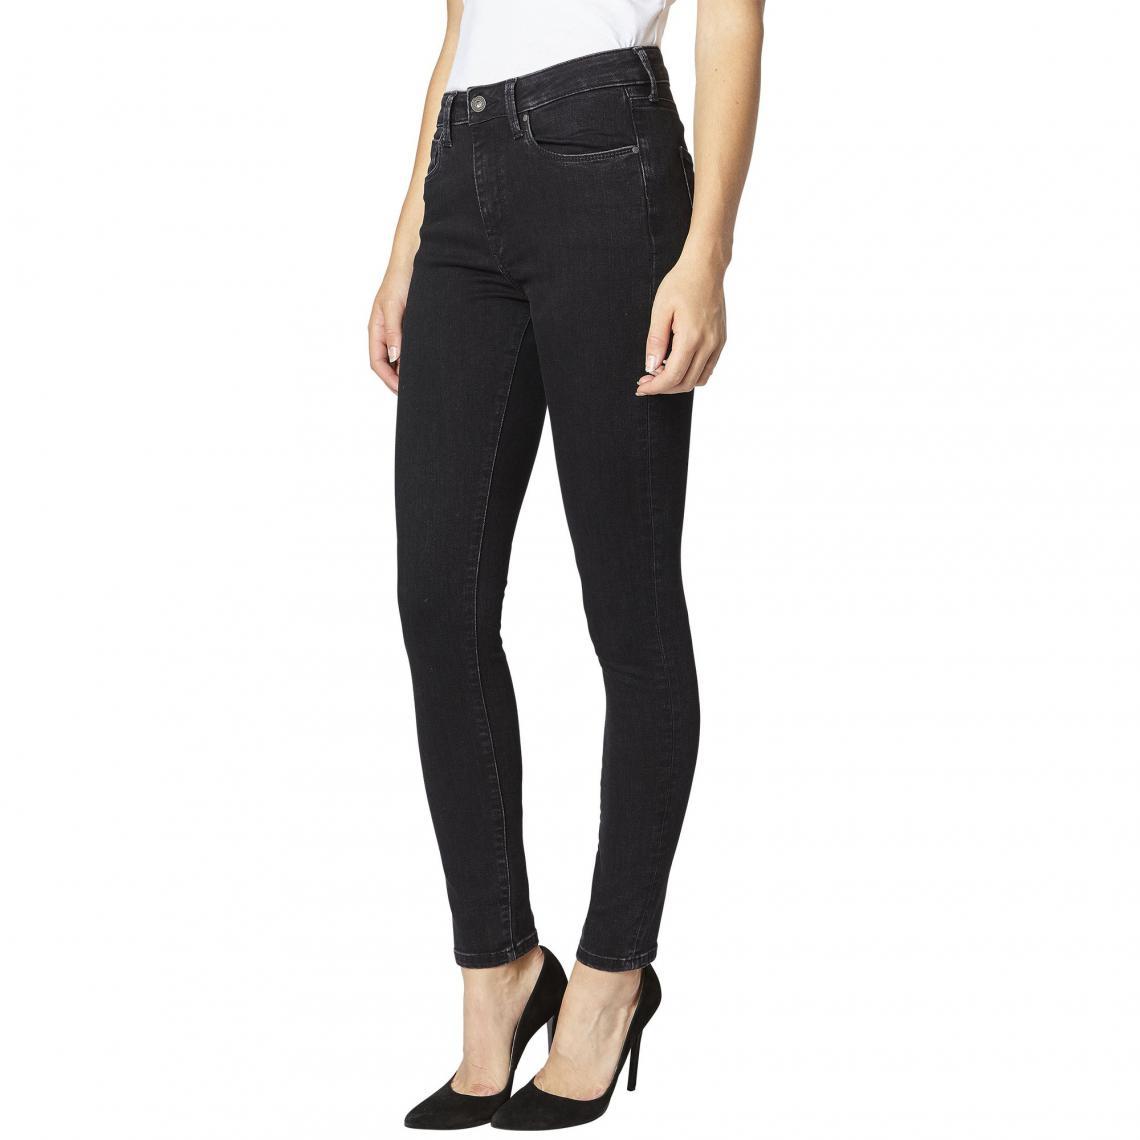 d6077ac84df Jean skinny L32 Regent Powerflex femme Pepe Jeans - GREY USED Pepe Jeans  Femme